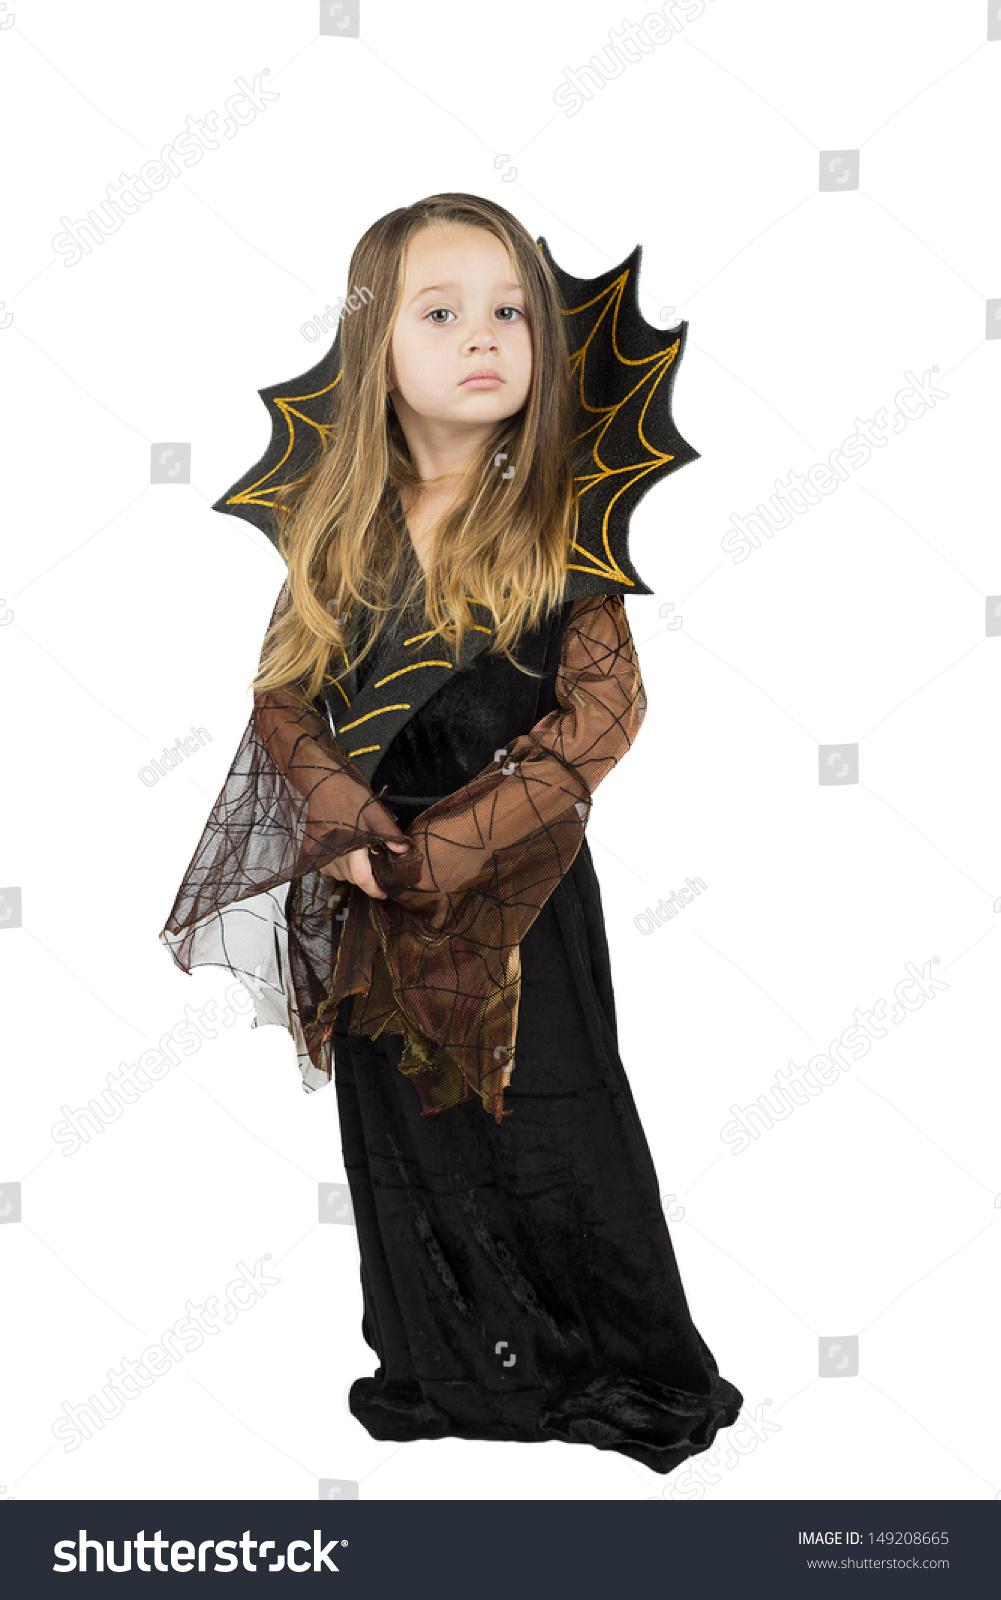 cute little girl halloween costume dark stock photo (edit now